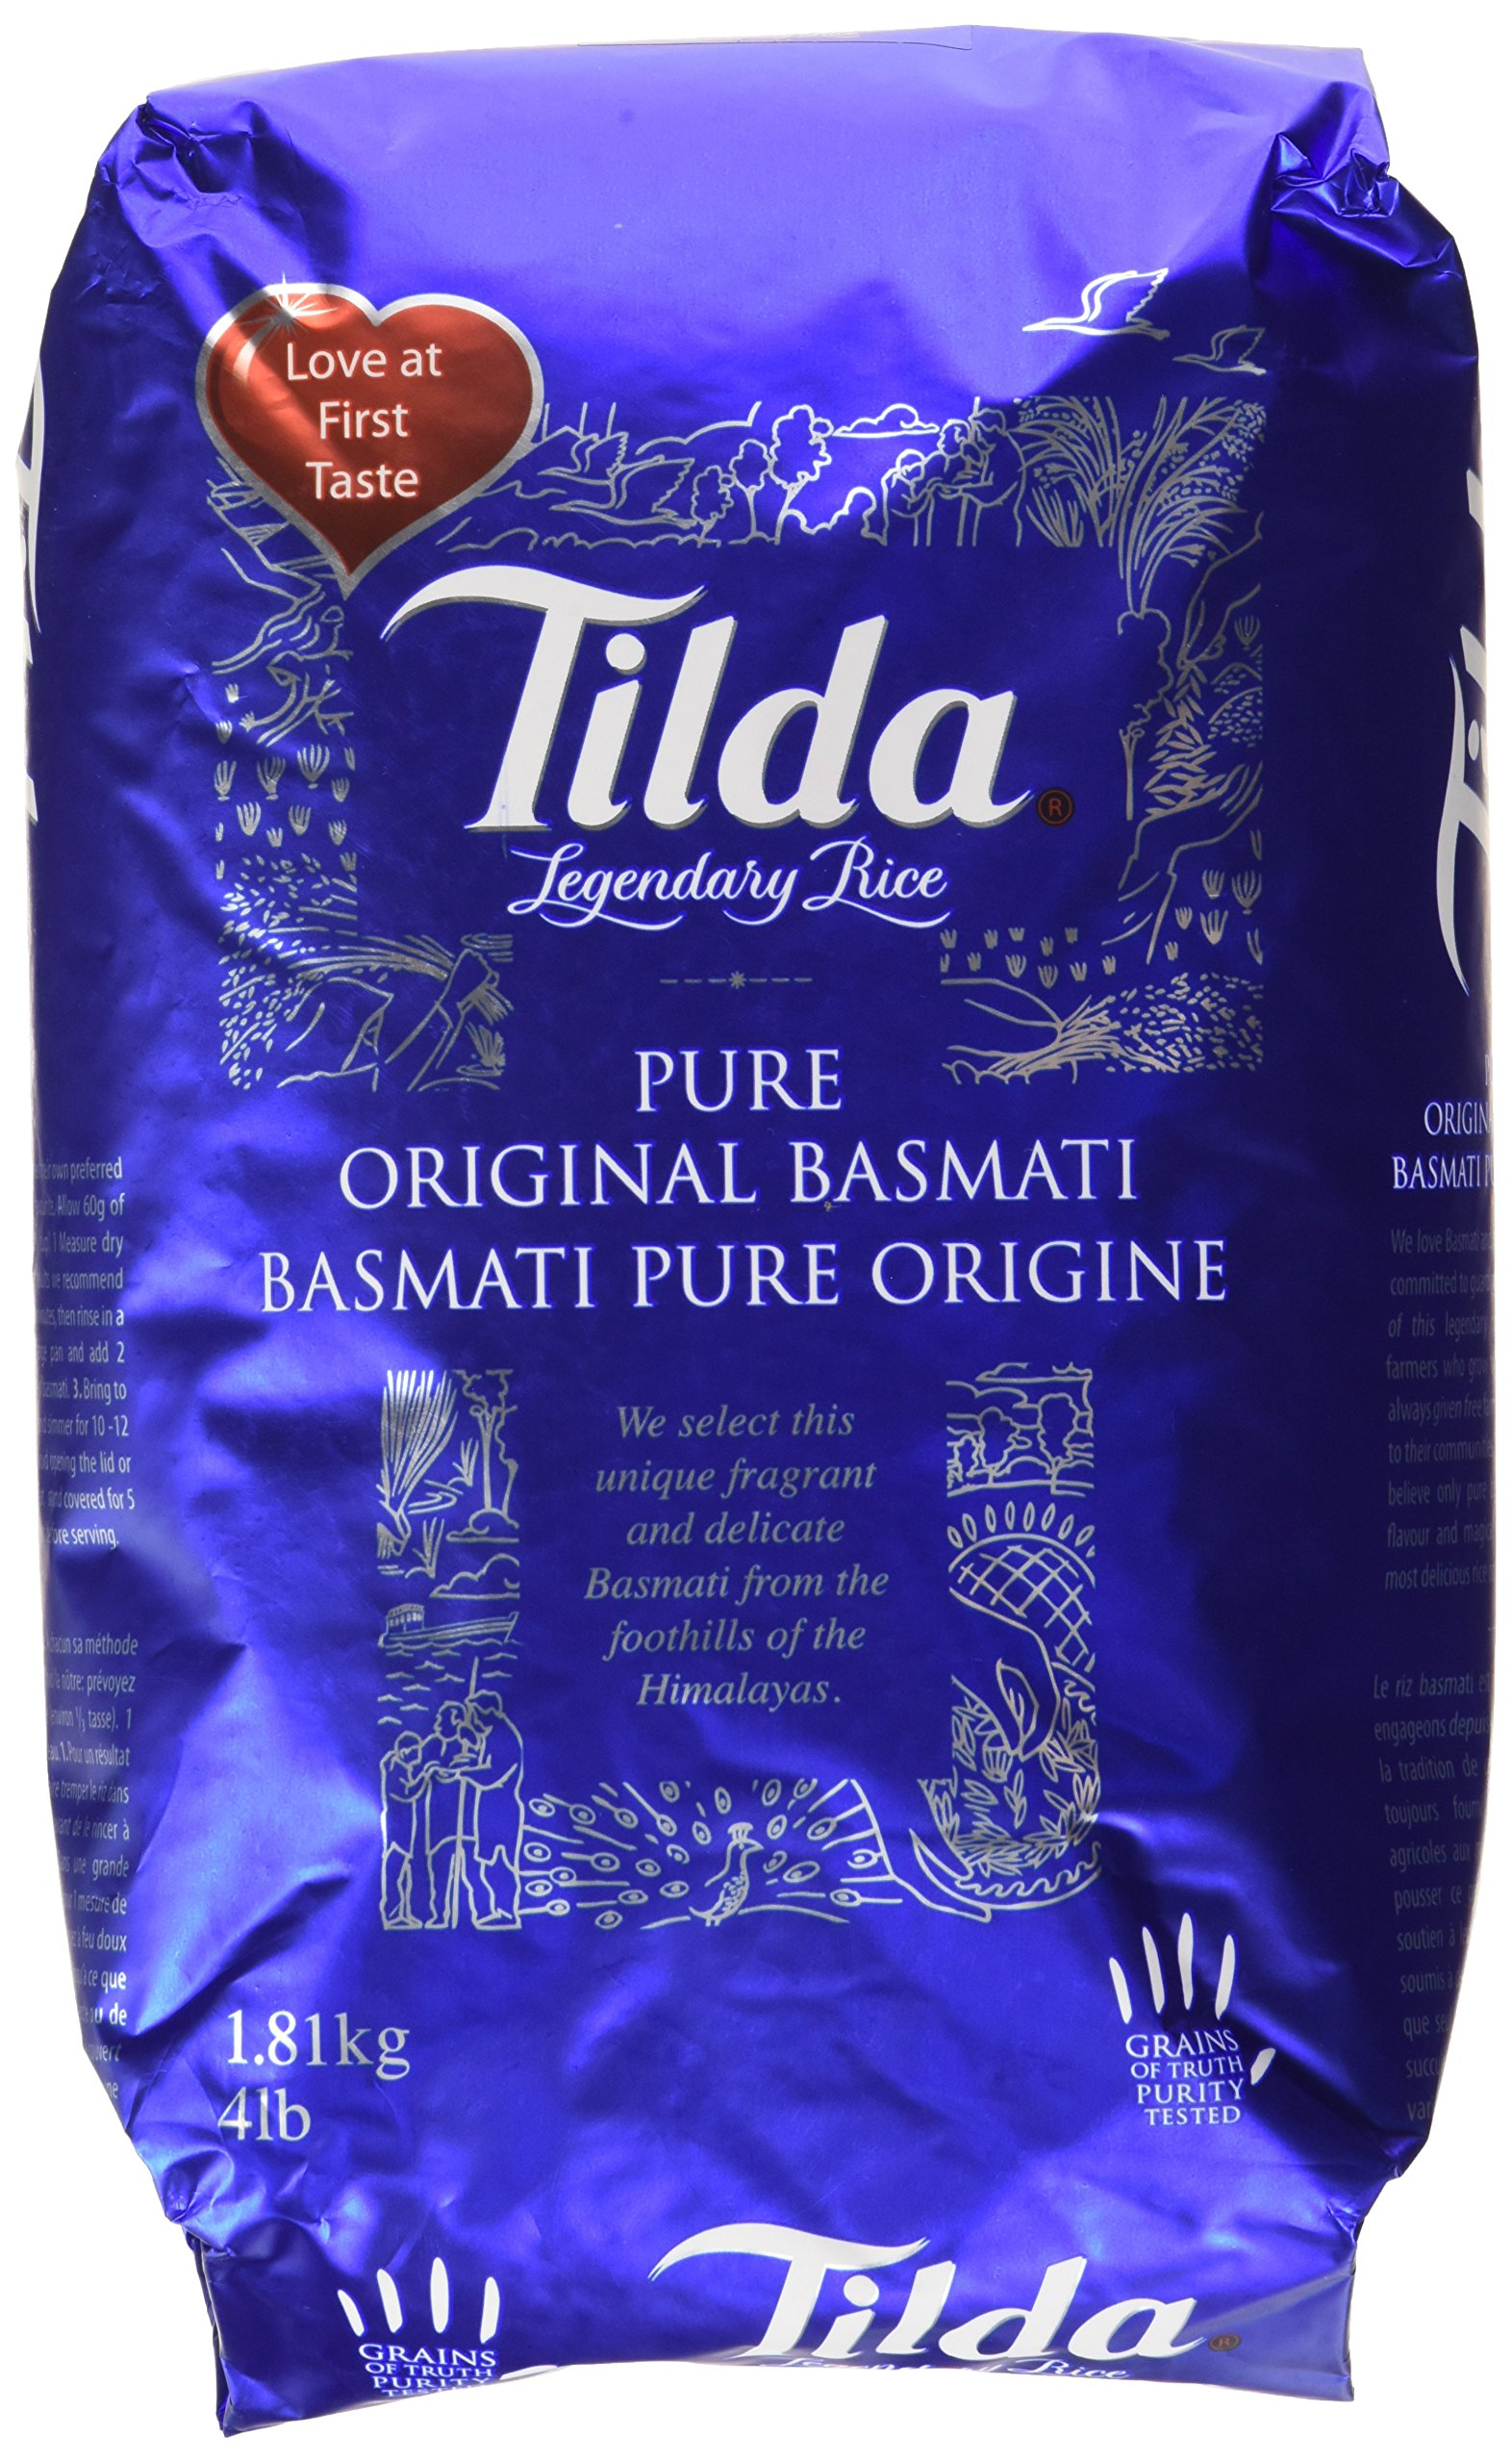 Tilda Legendary Rice, Pure Original Basmati, 4 Pound